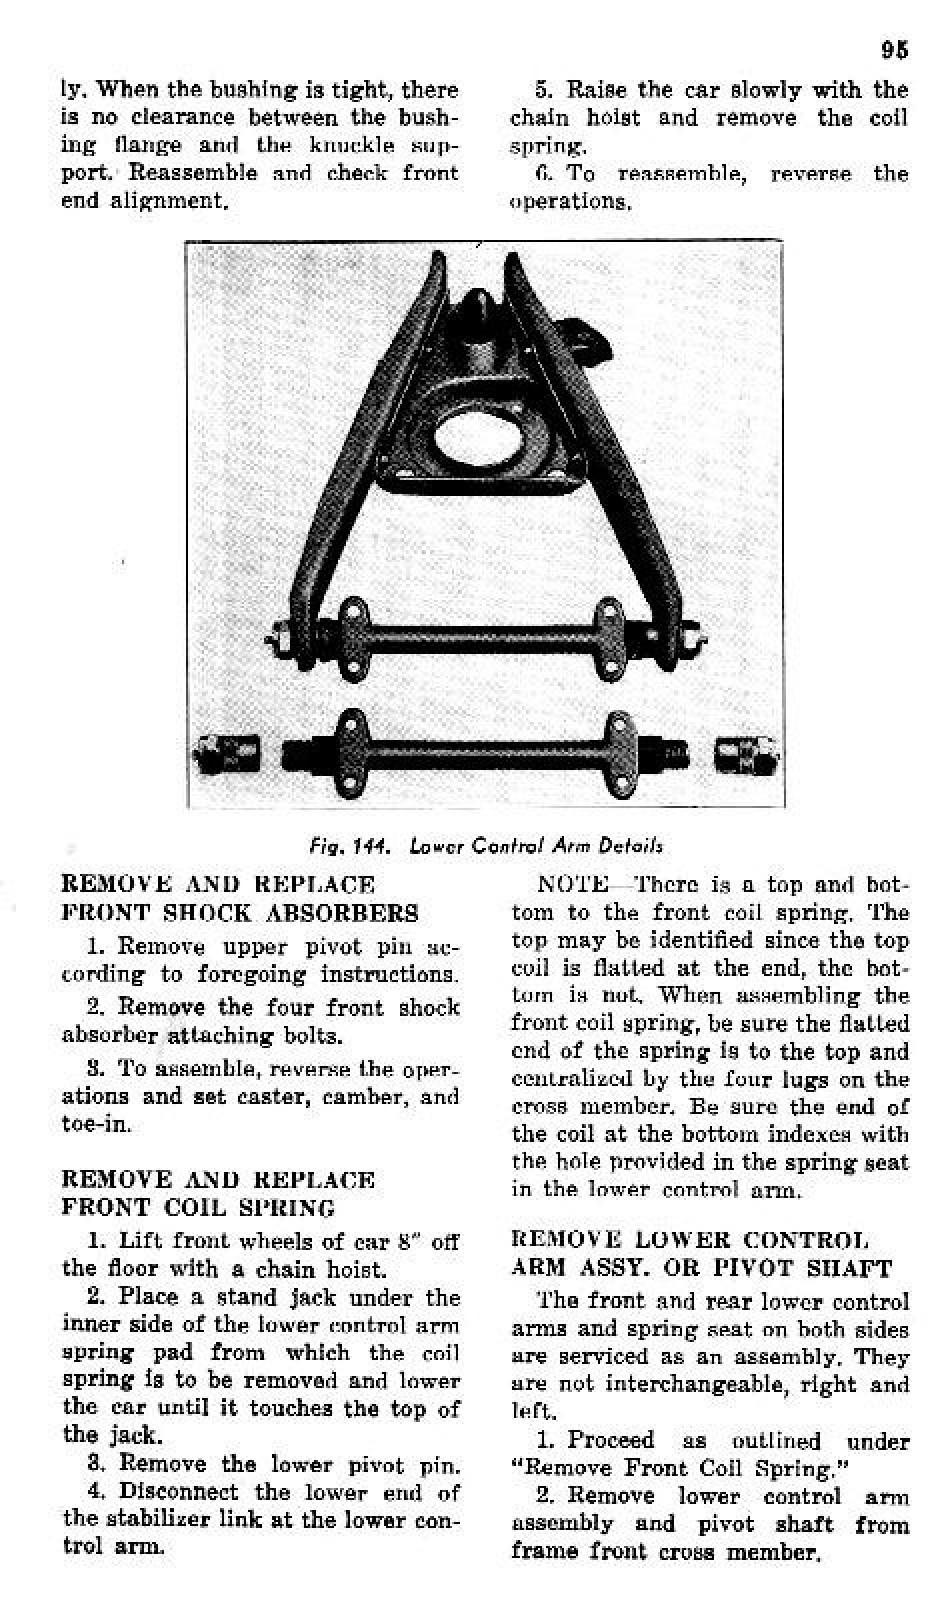 1941 Pontiac Shop Manual- Front Suspension Page 12 of 22